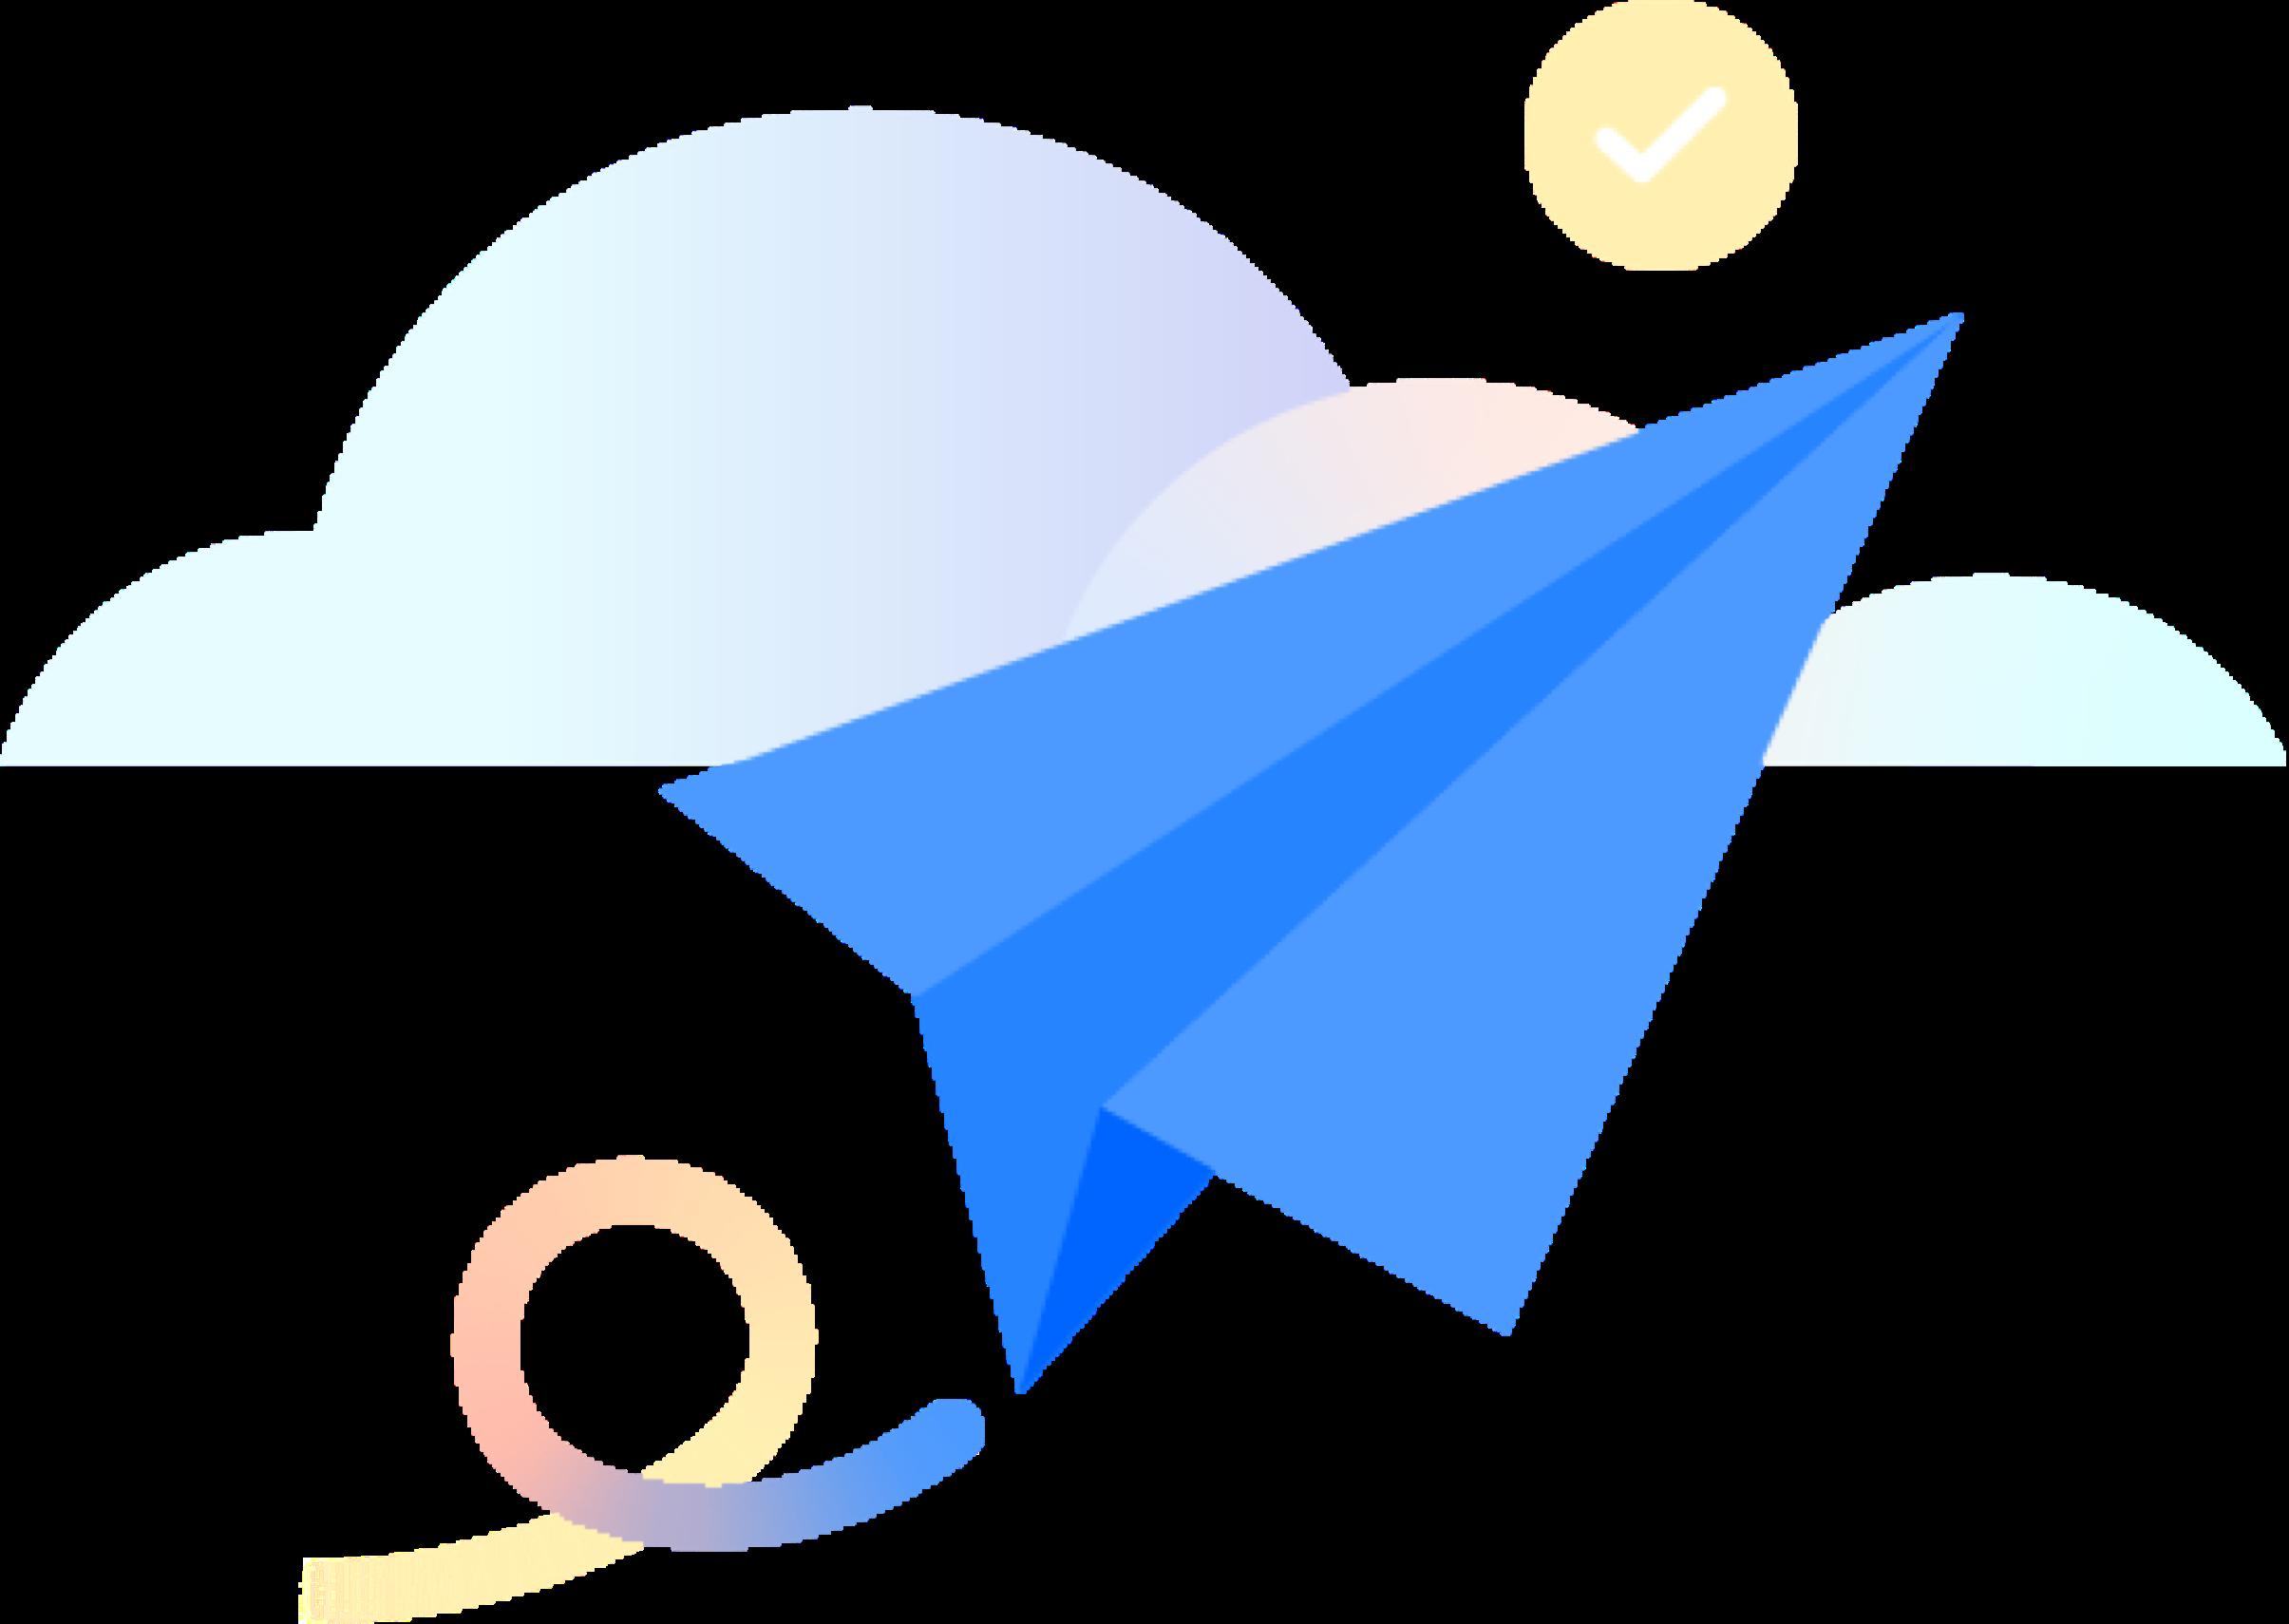 Aeroplano di carta tra le nuvole